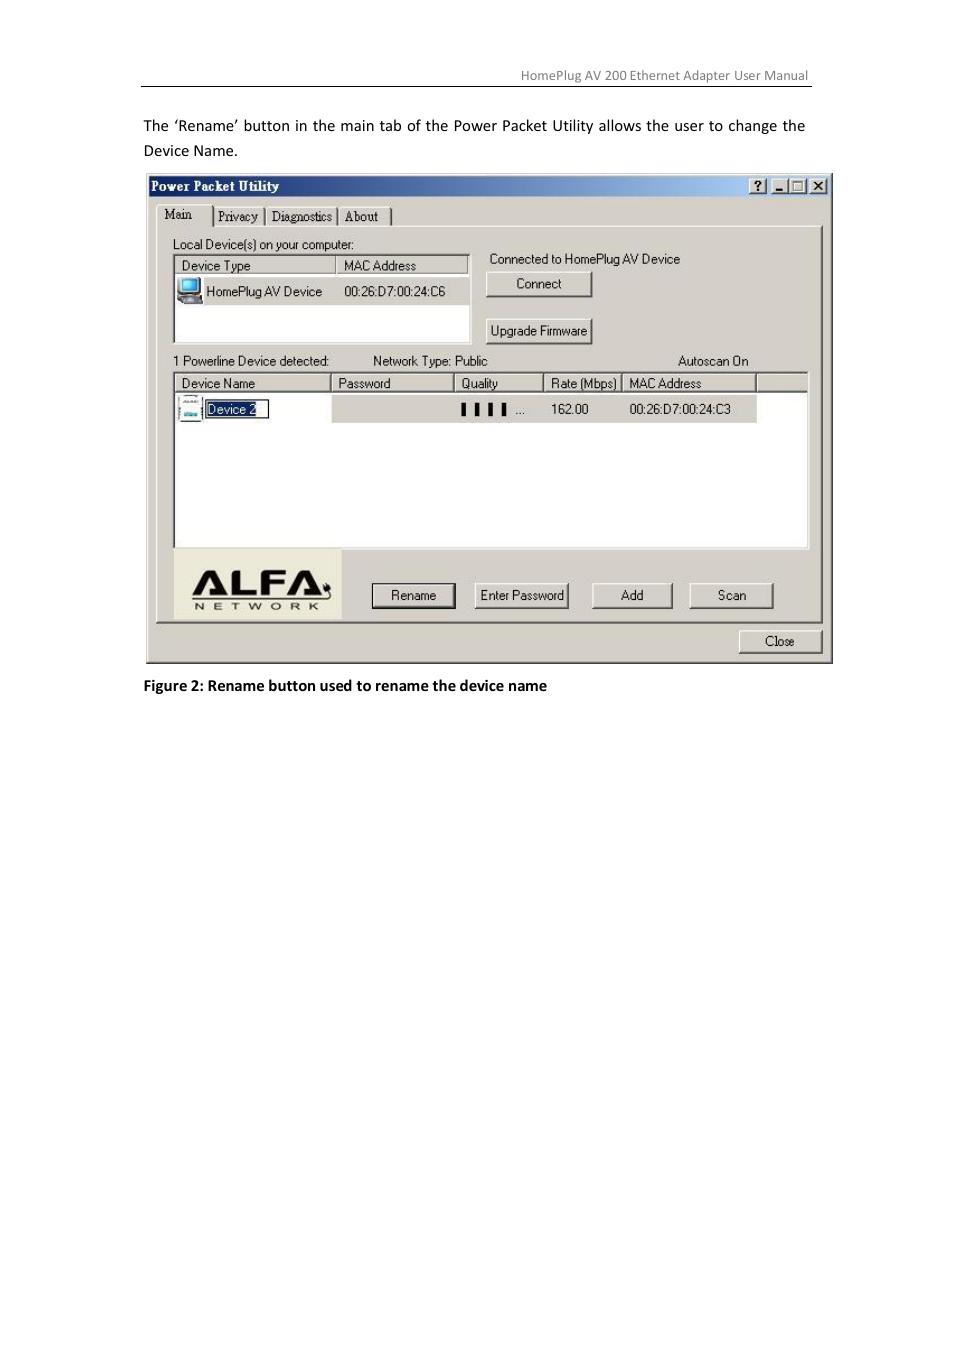 alfa network ahpe305 user manual page 27 39 rh manualsdir com Alfa Network 802.11G Alfa Network AWUS036NH